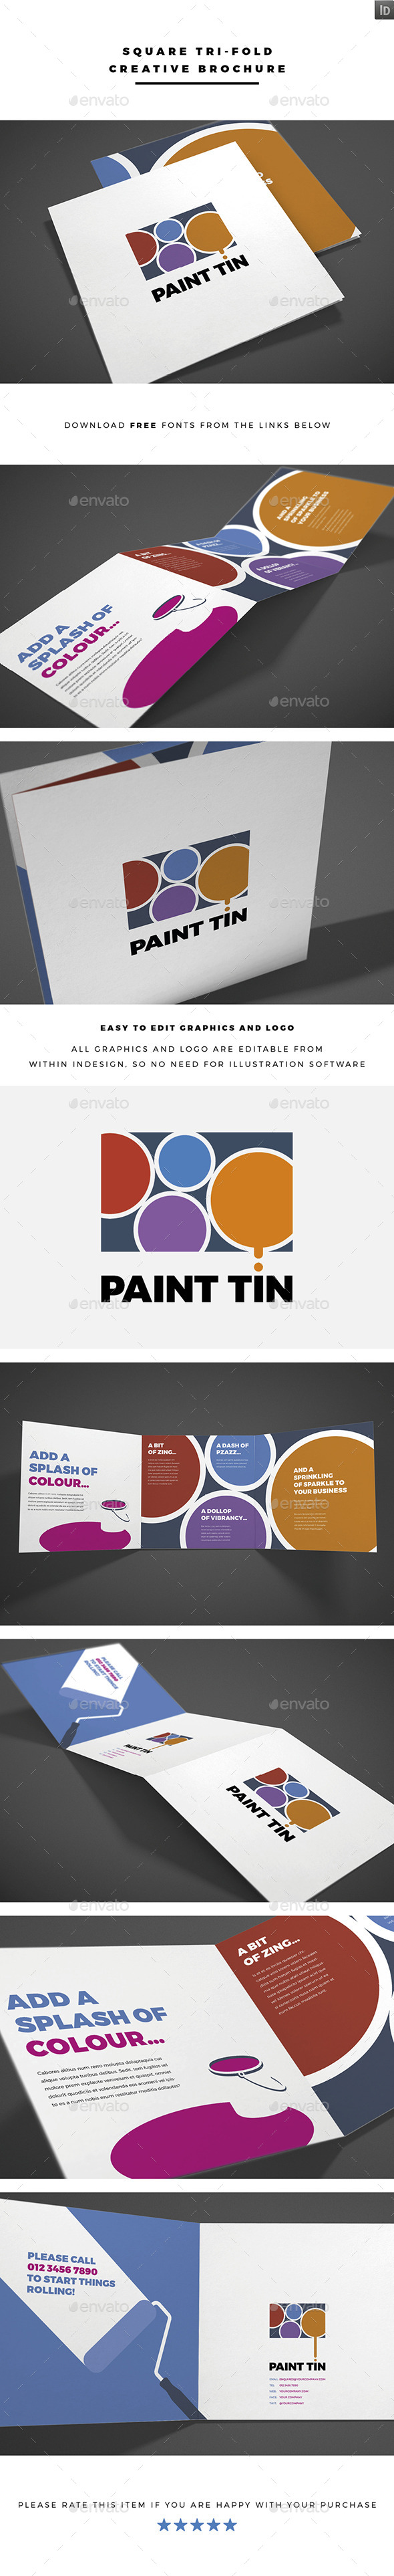 Square Tri-fold Creative Brochure Vol.3 - Brochures Print Templates